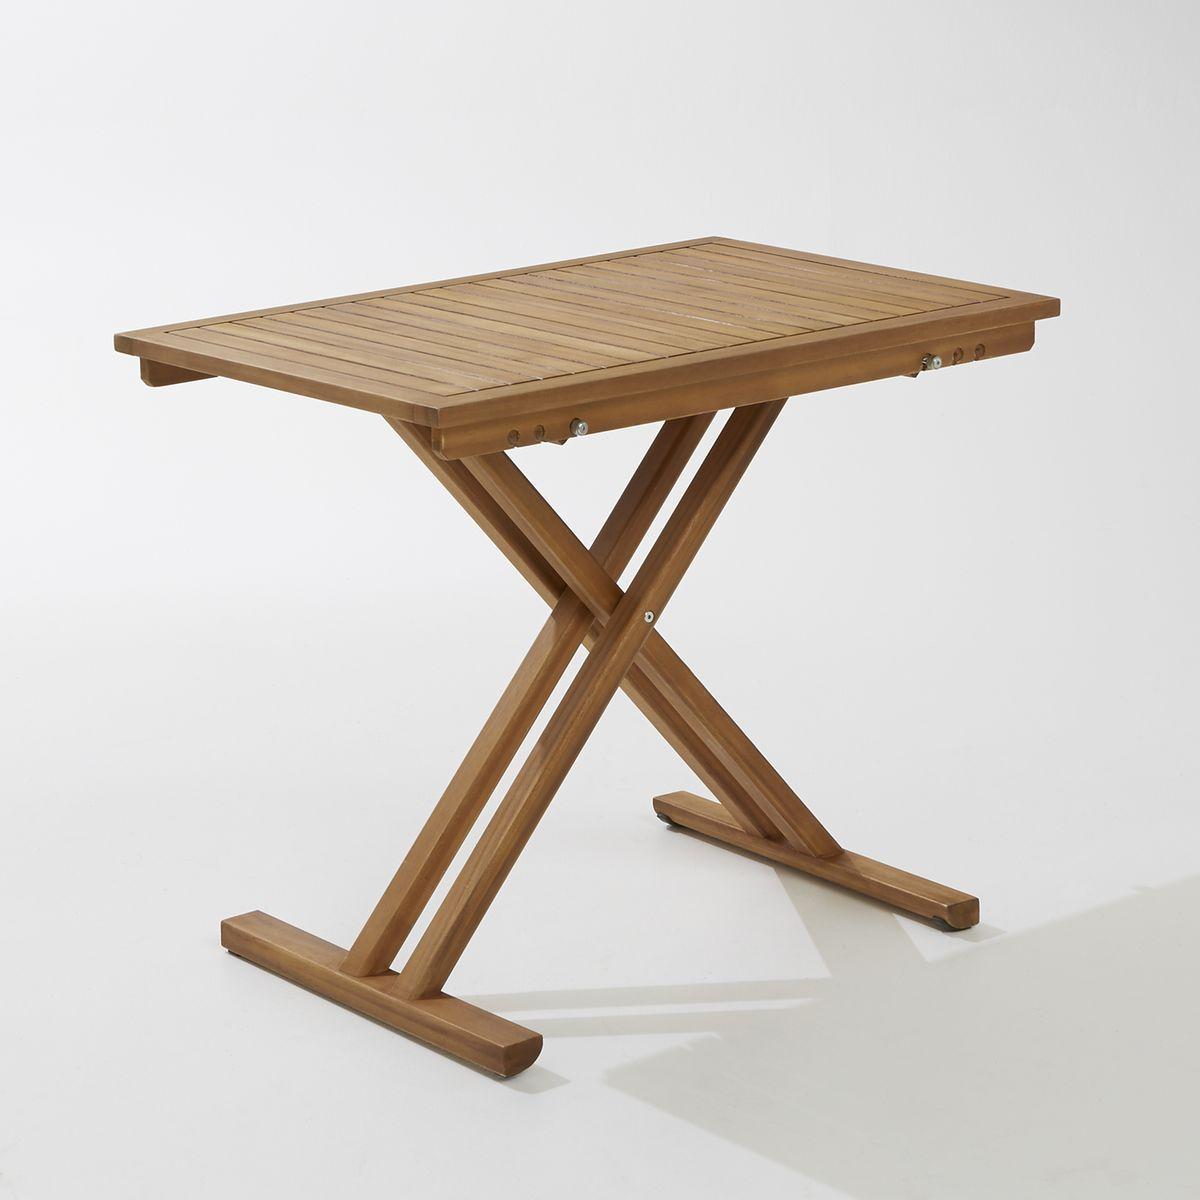 Table de jardin pliante en acacia et finition teck ...